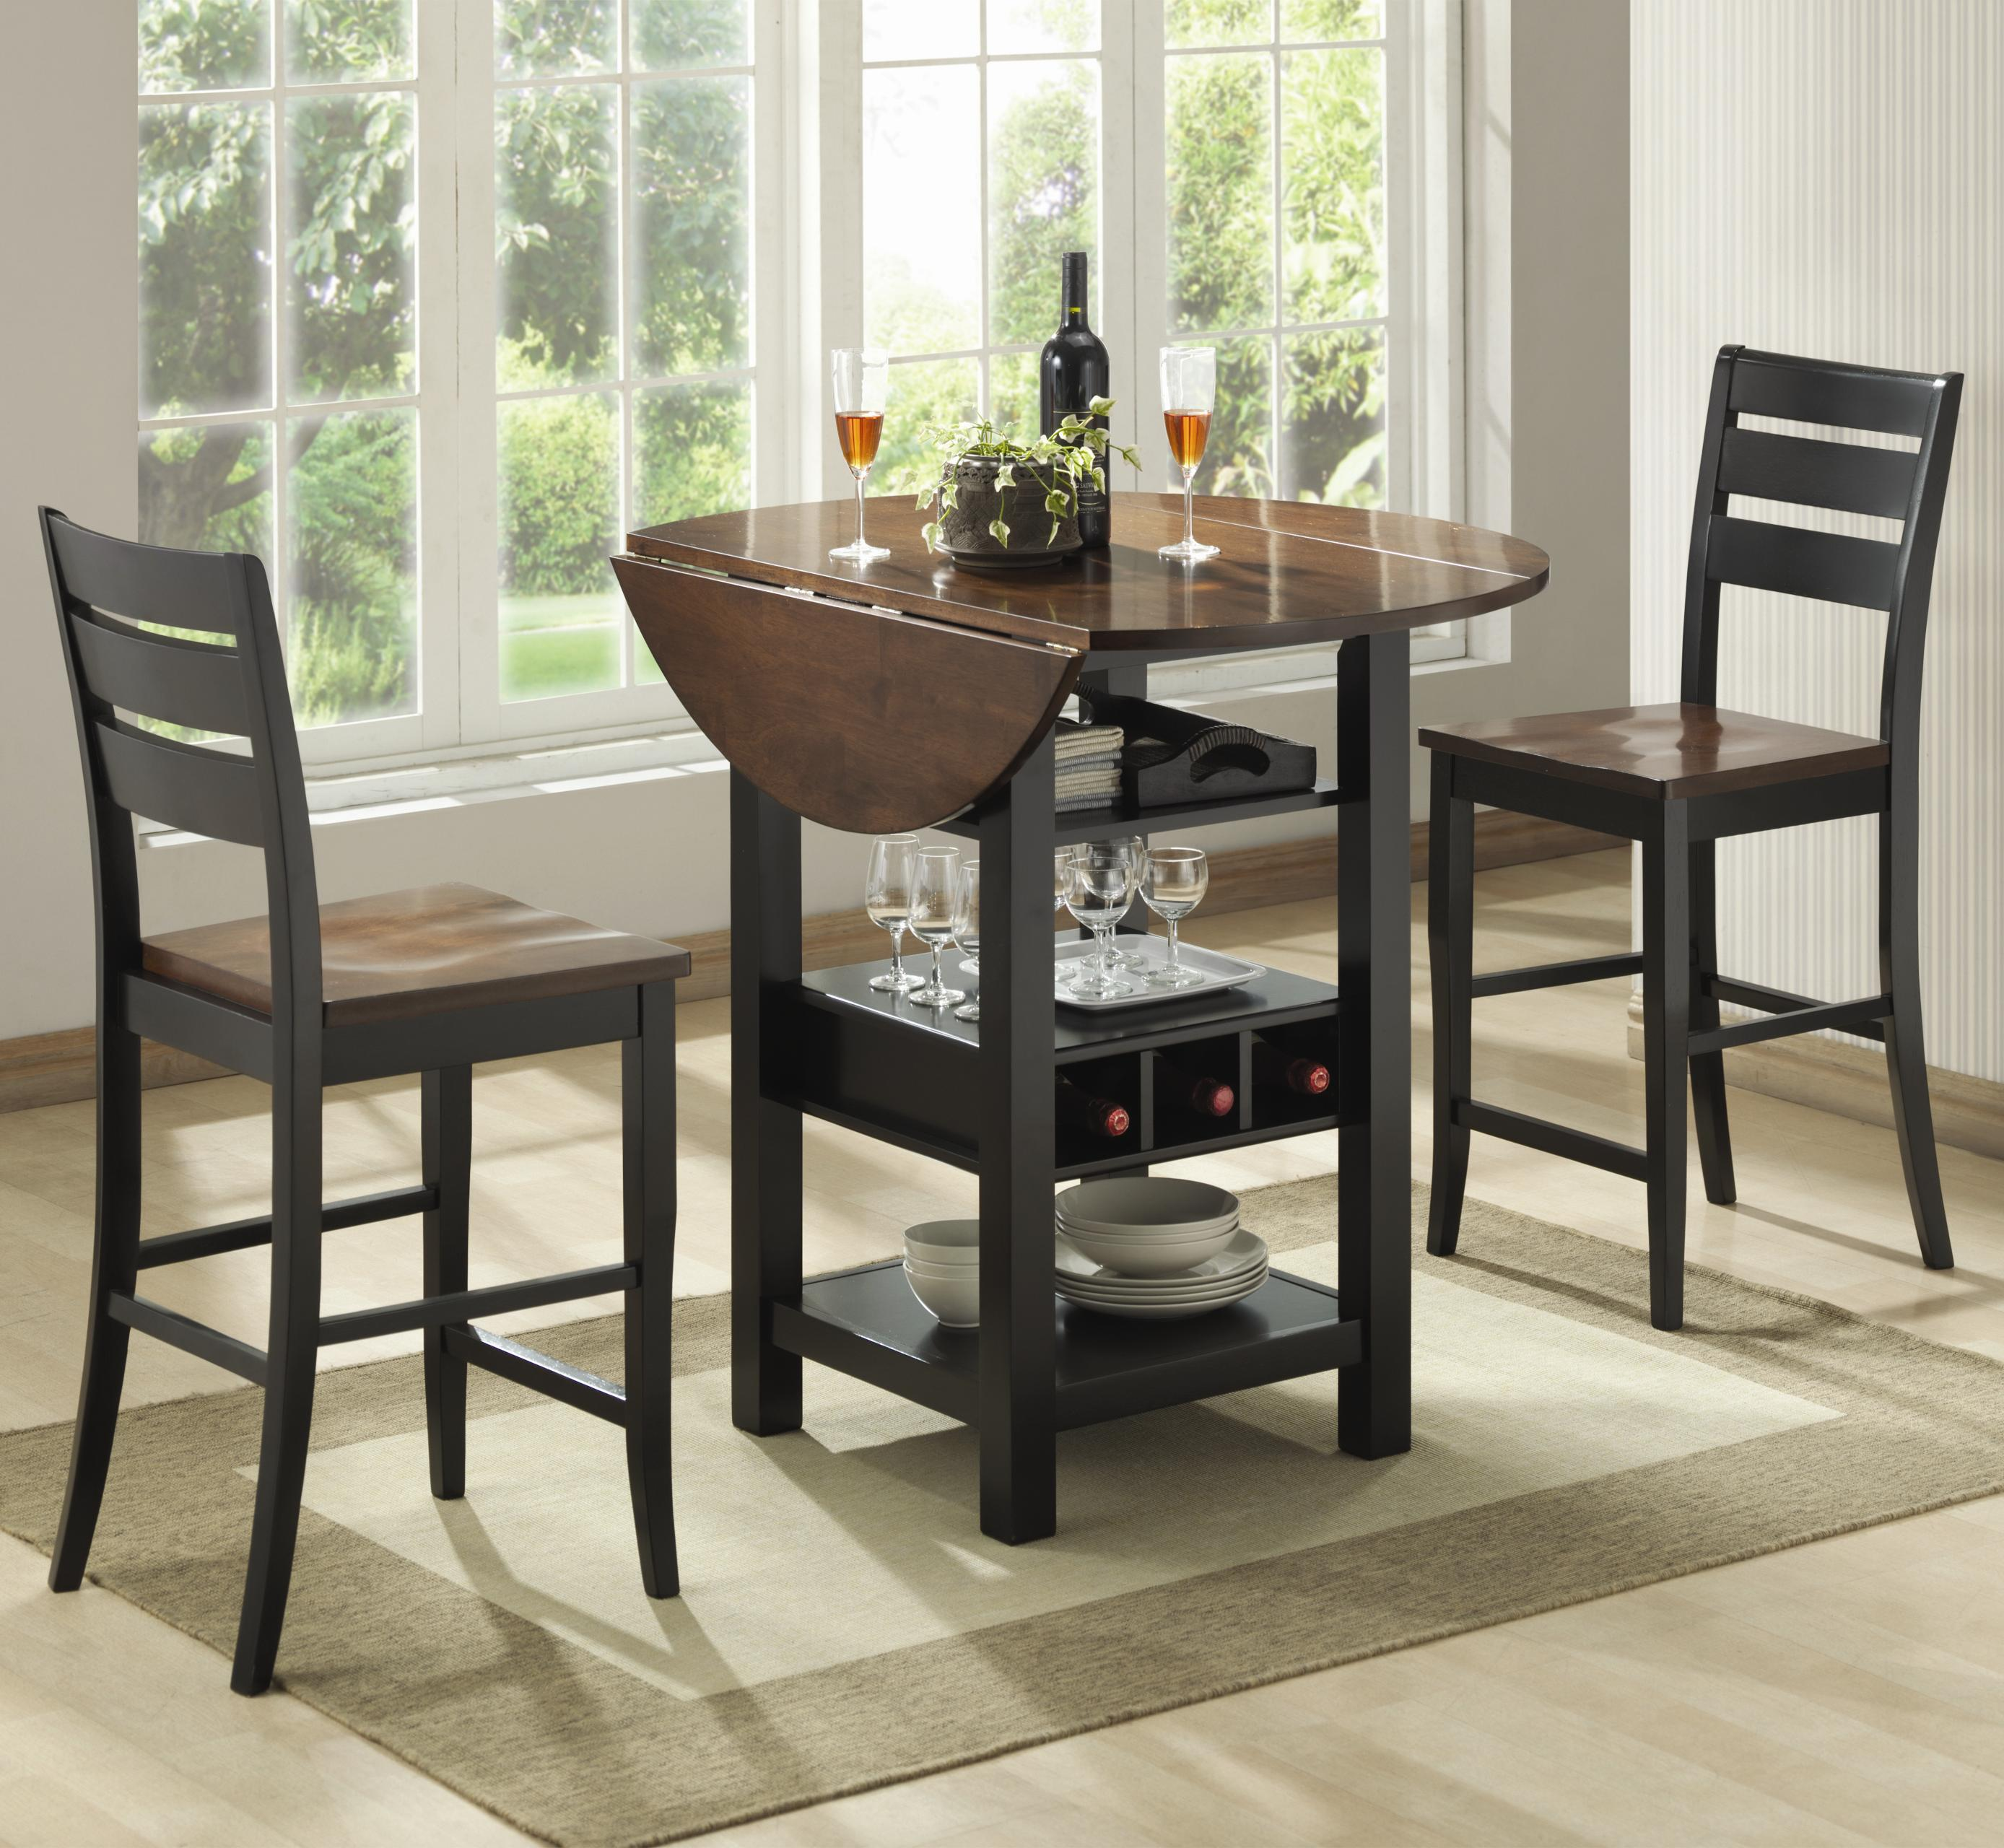 Bernards ridgewood 3 piece drop leaf pub table set for Pub style dining sets